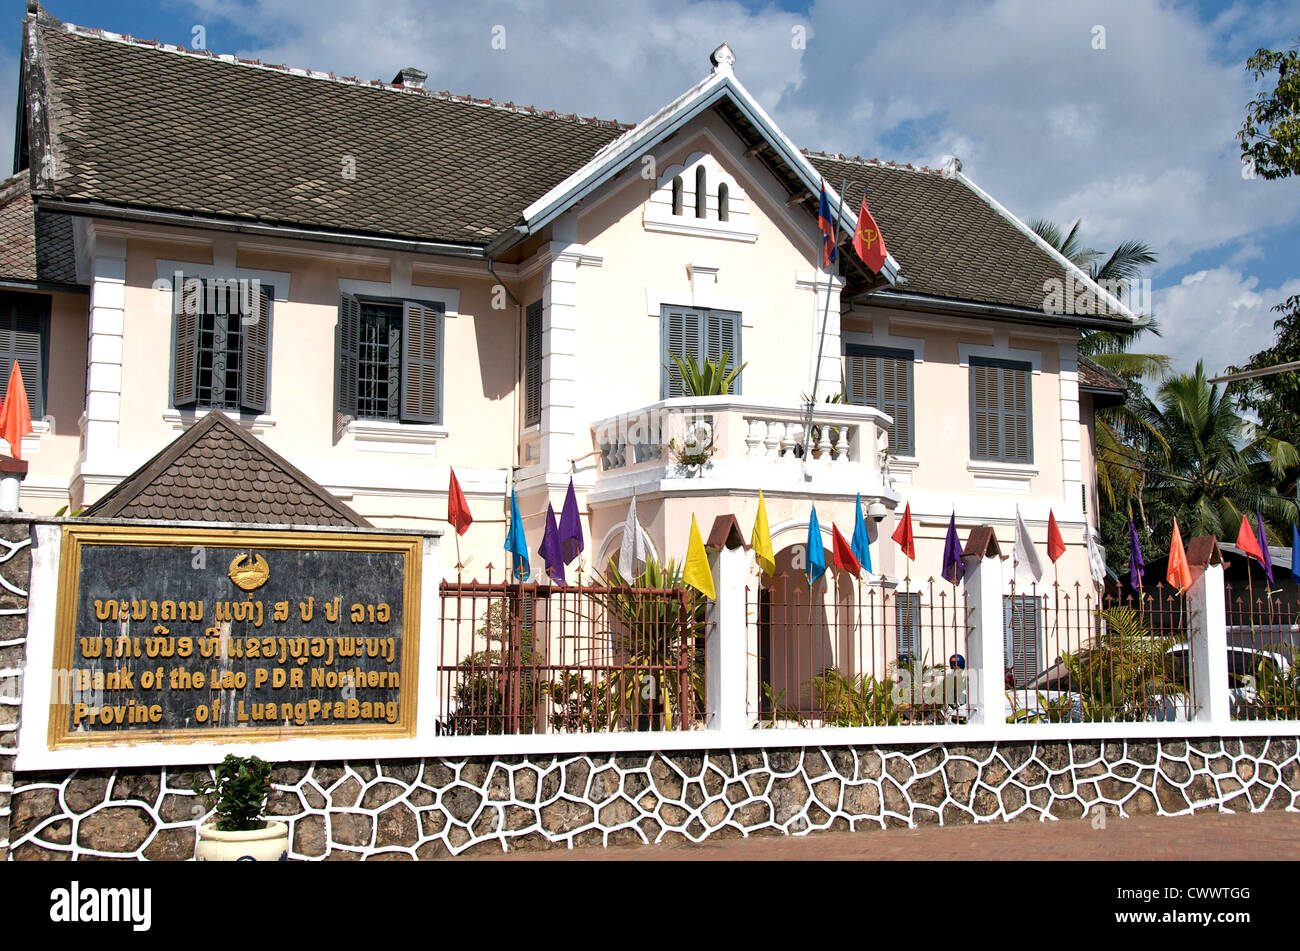 Bank of the Lao PDR Northern Province Luang Prabang Laos - Stock Image